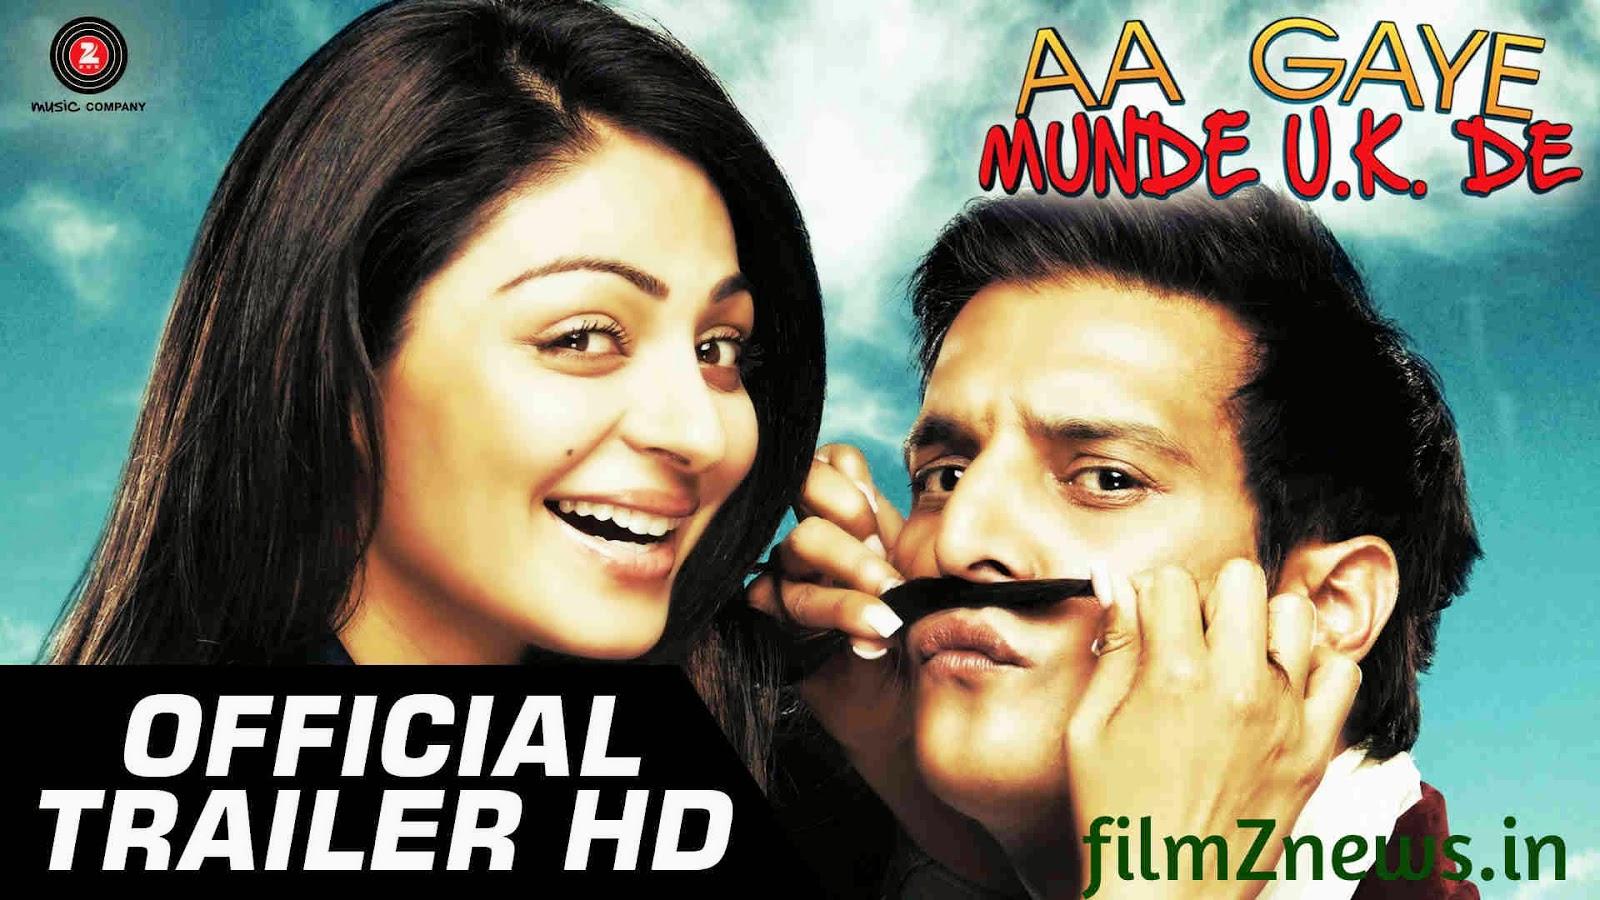 Aa Gaye Munde U.K De (2014) Official Trailer Video - Jimmy Shergill & Neeru Bajwa